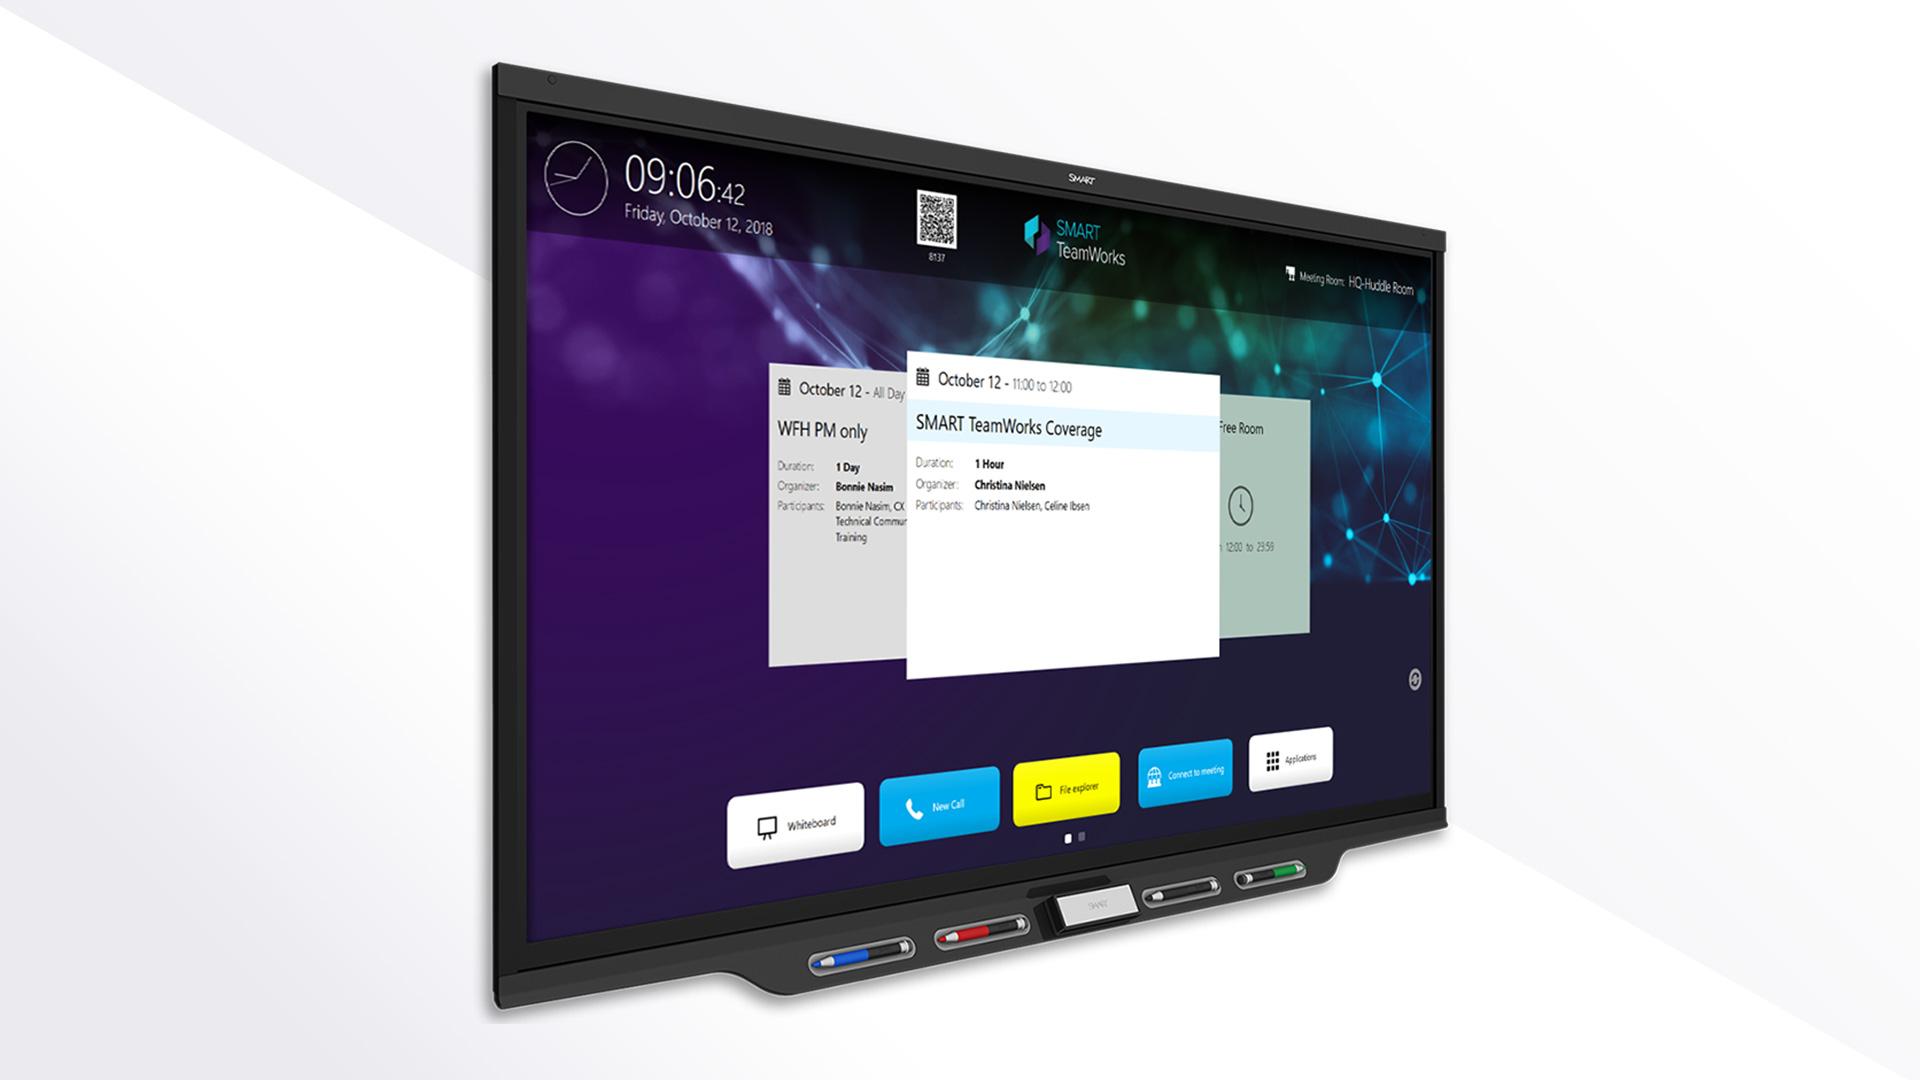 SMART Board iQ Pro